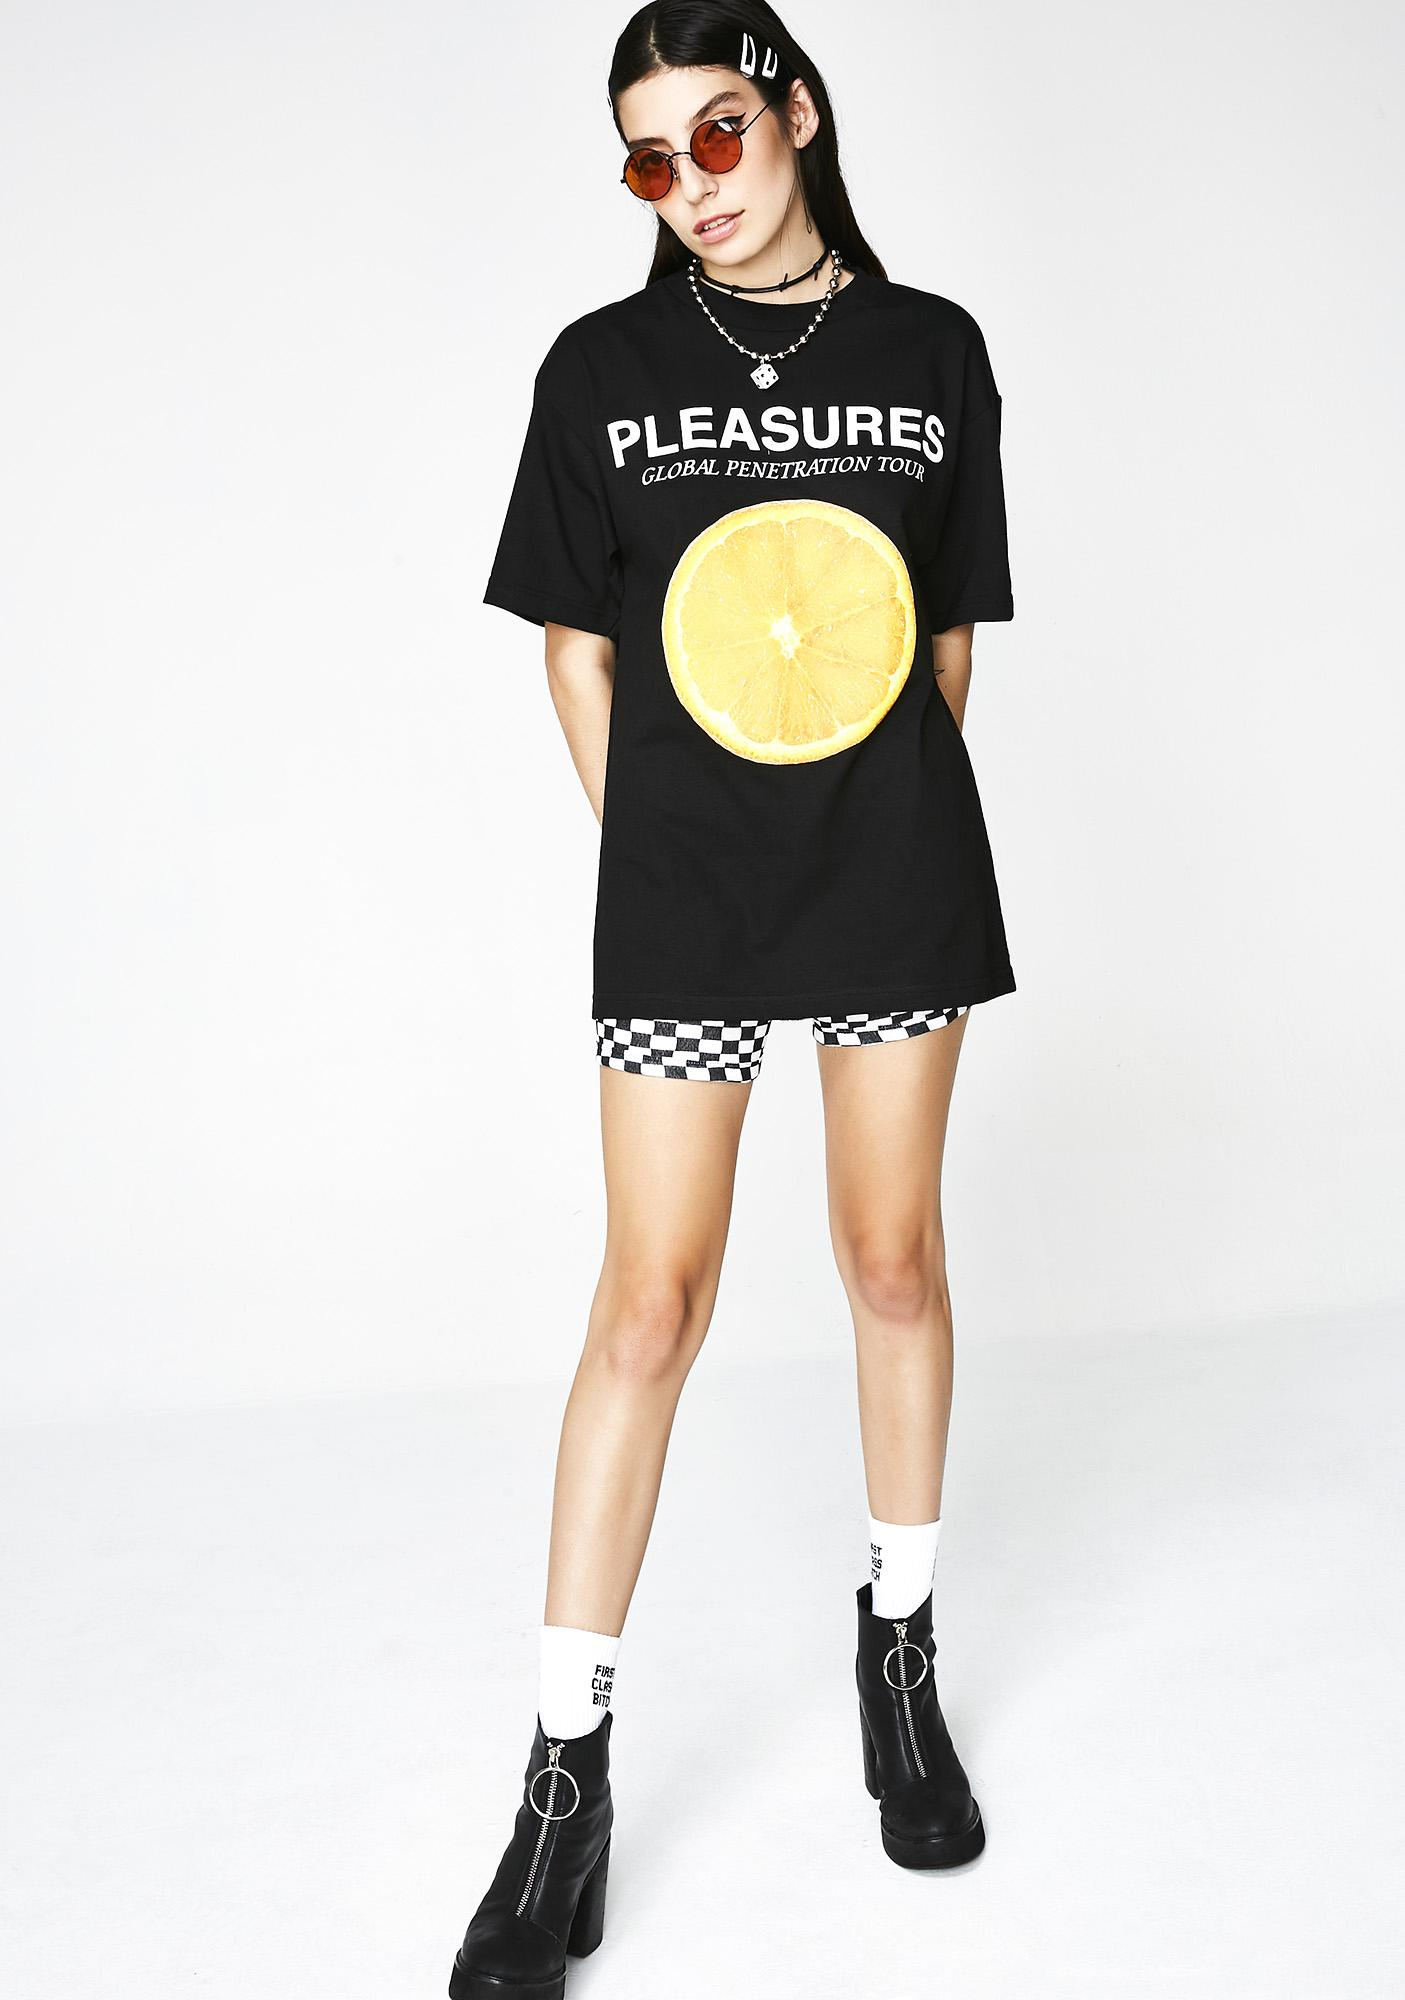 Pleasures Penetration T-Shirt